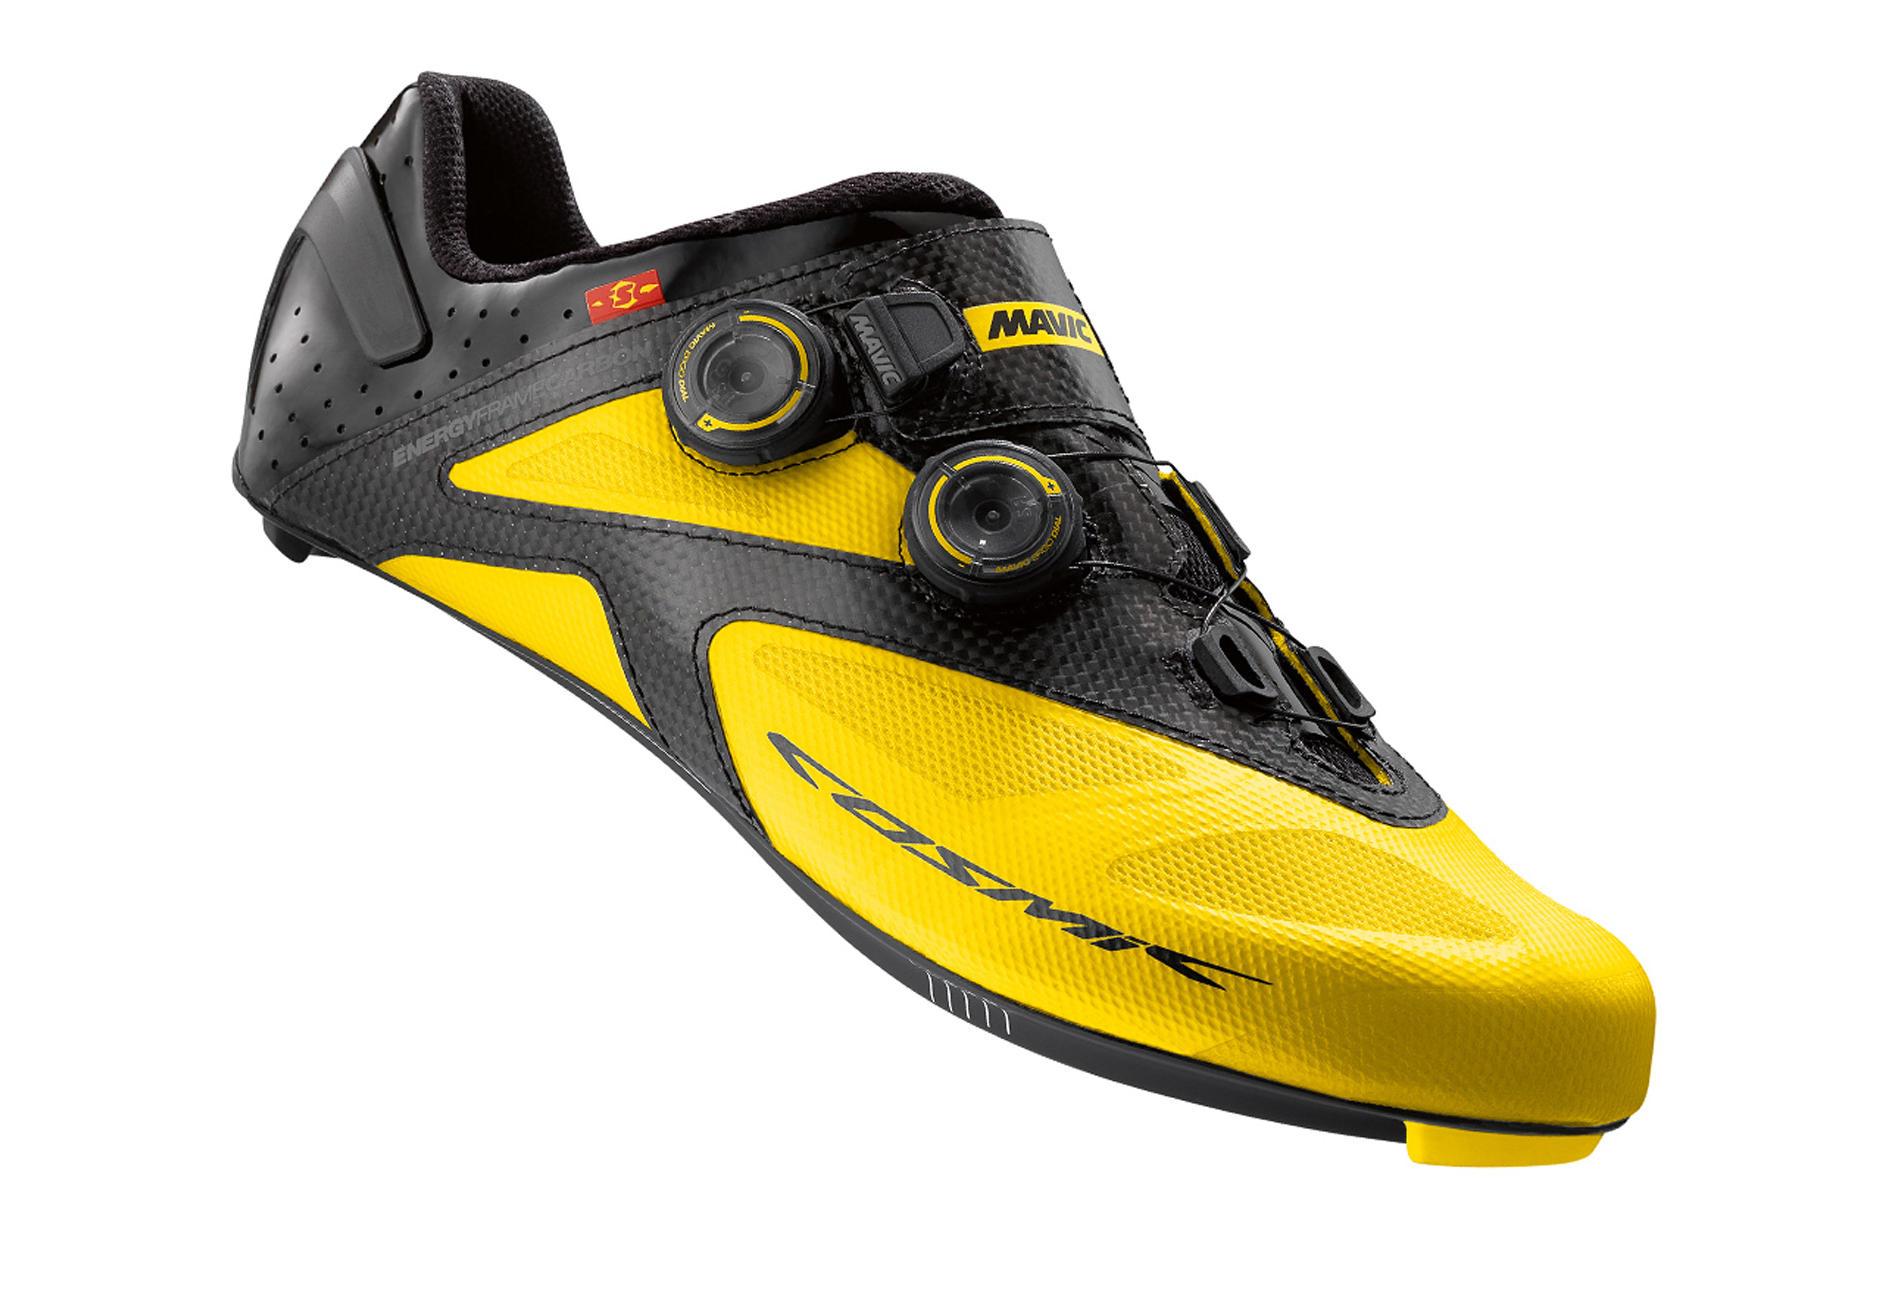 Ultimate Ii Gelb Cosmic Mavic Rennrad Schuhe EWY9H2DI